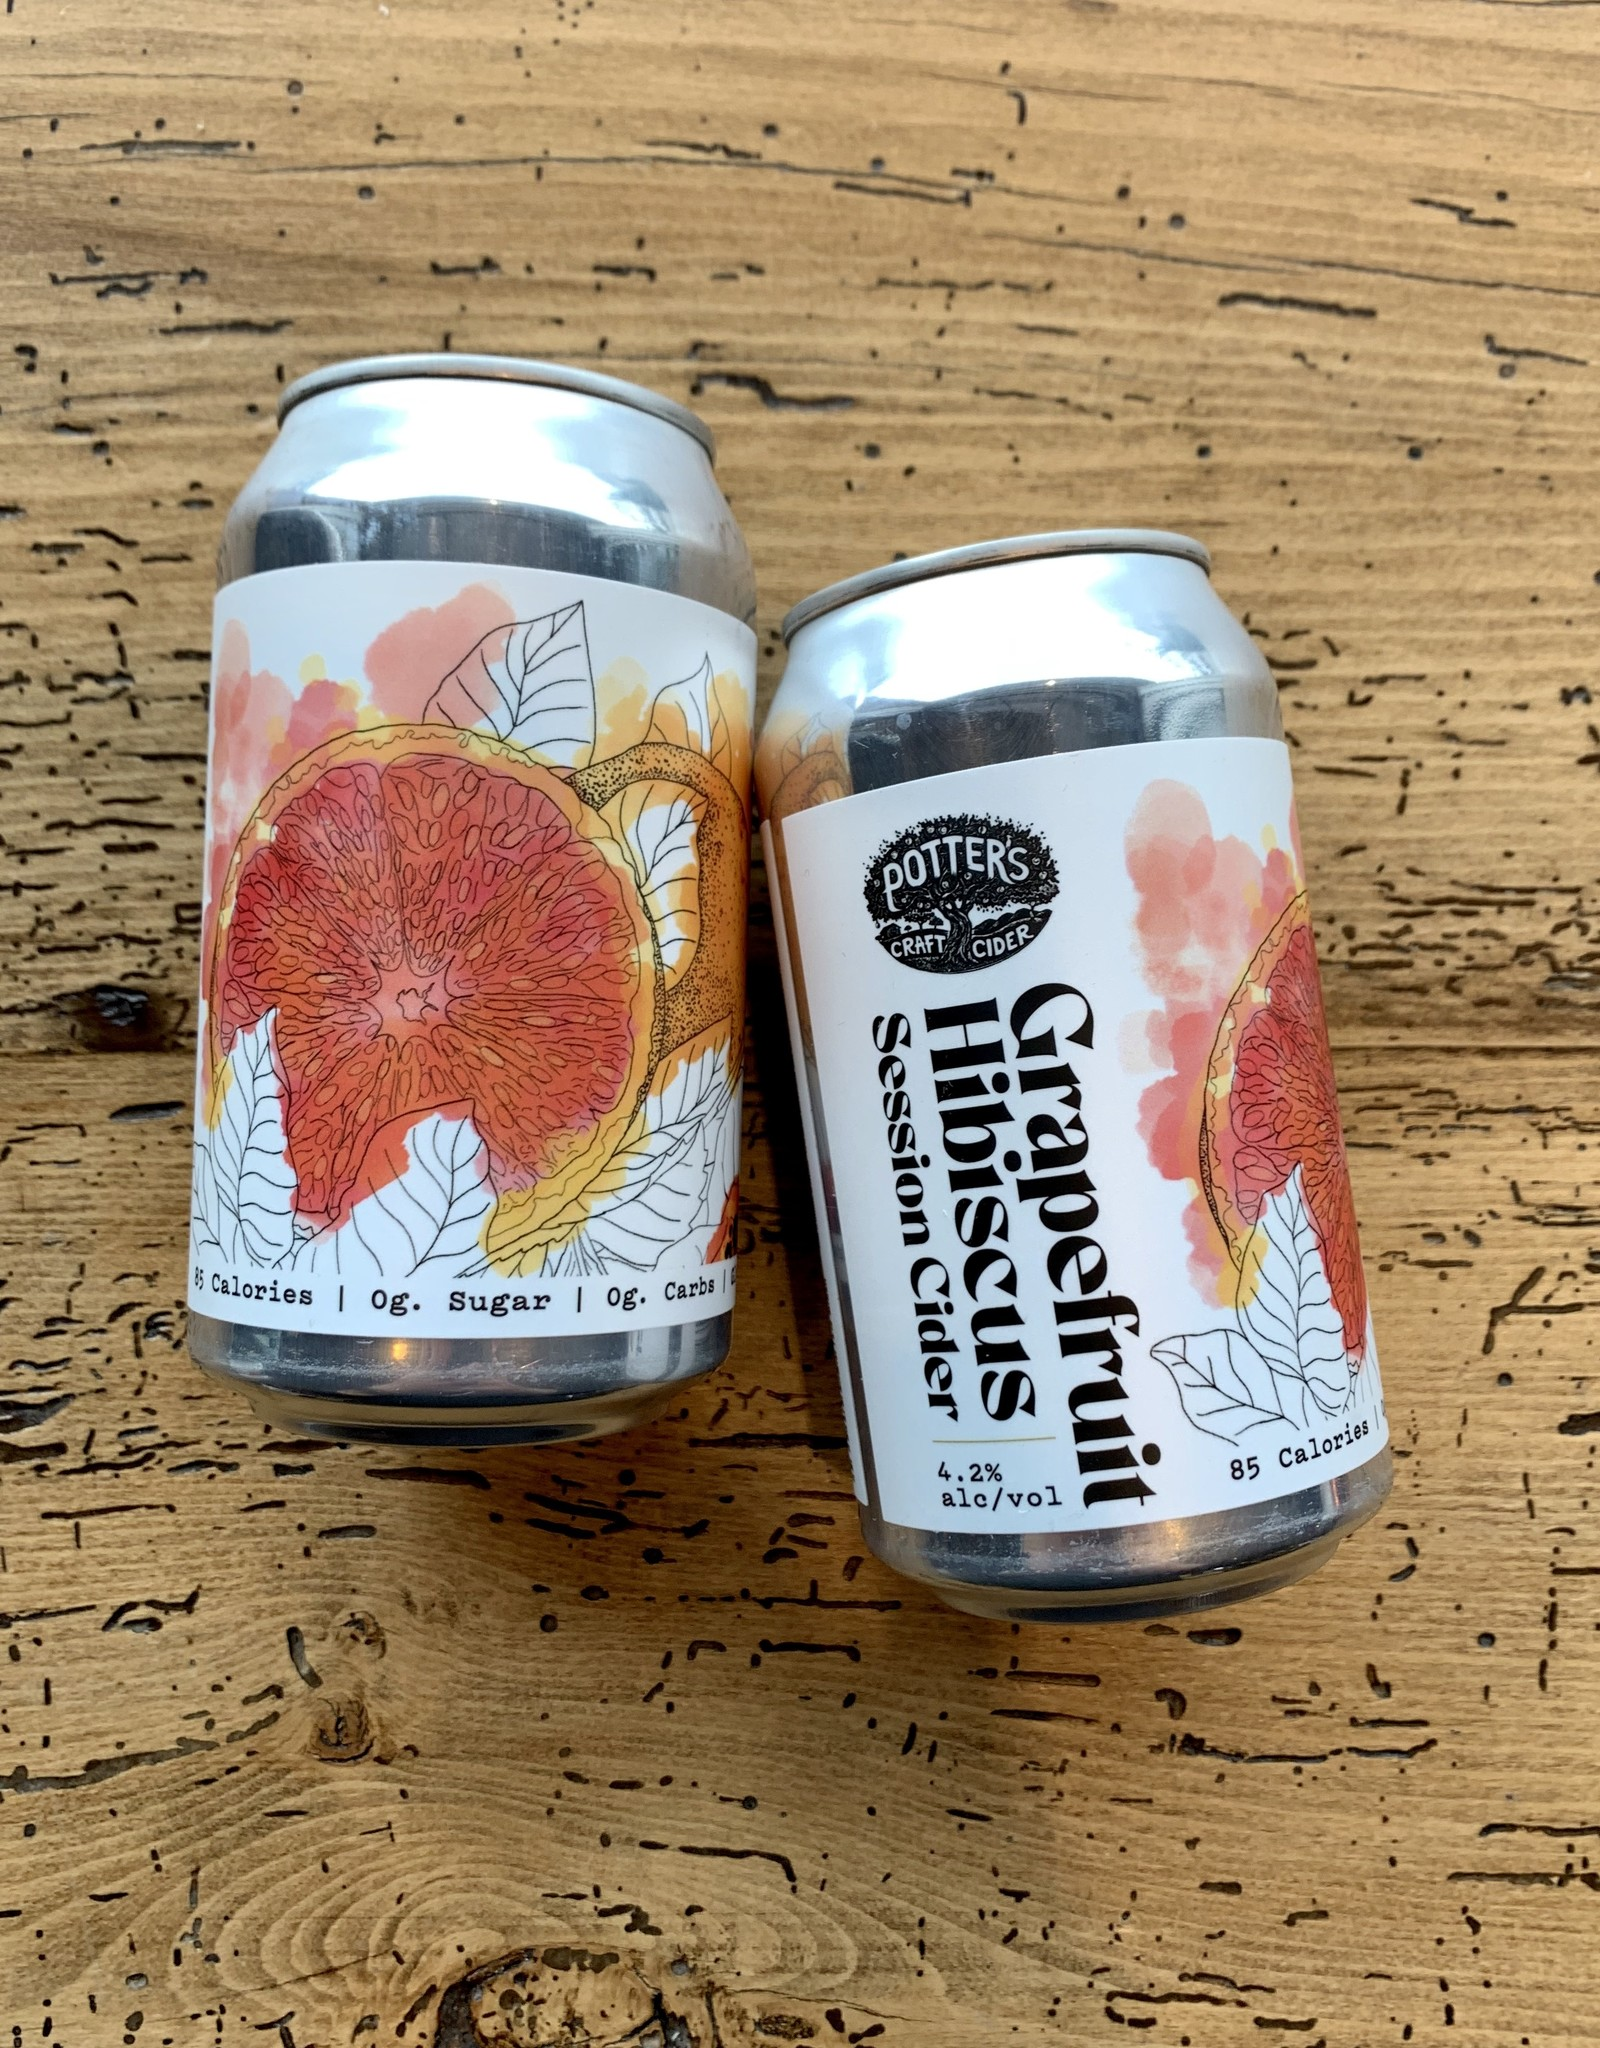 Potter's Grapefruit Hibiscus Cider 4pk